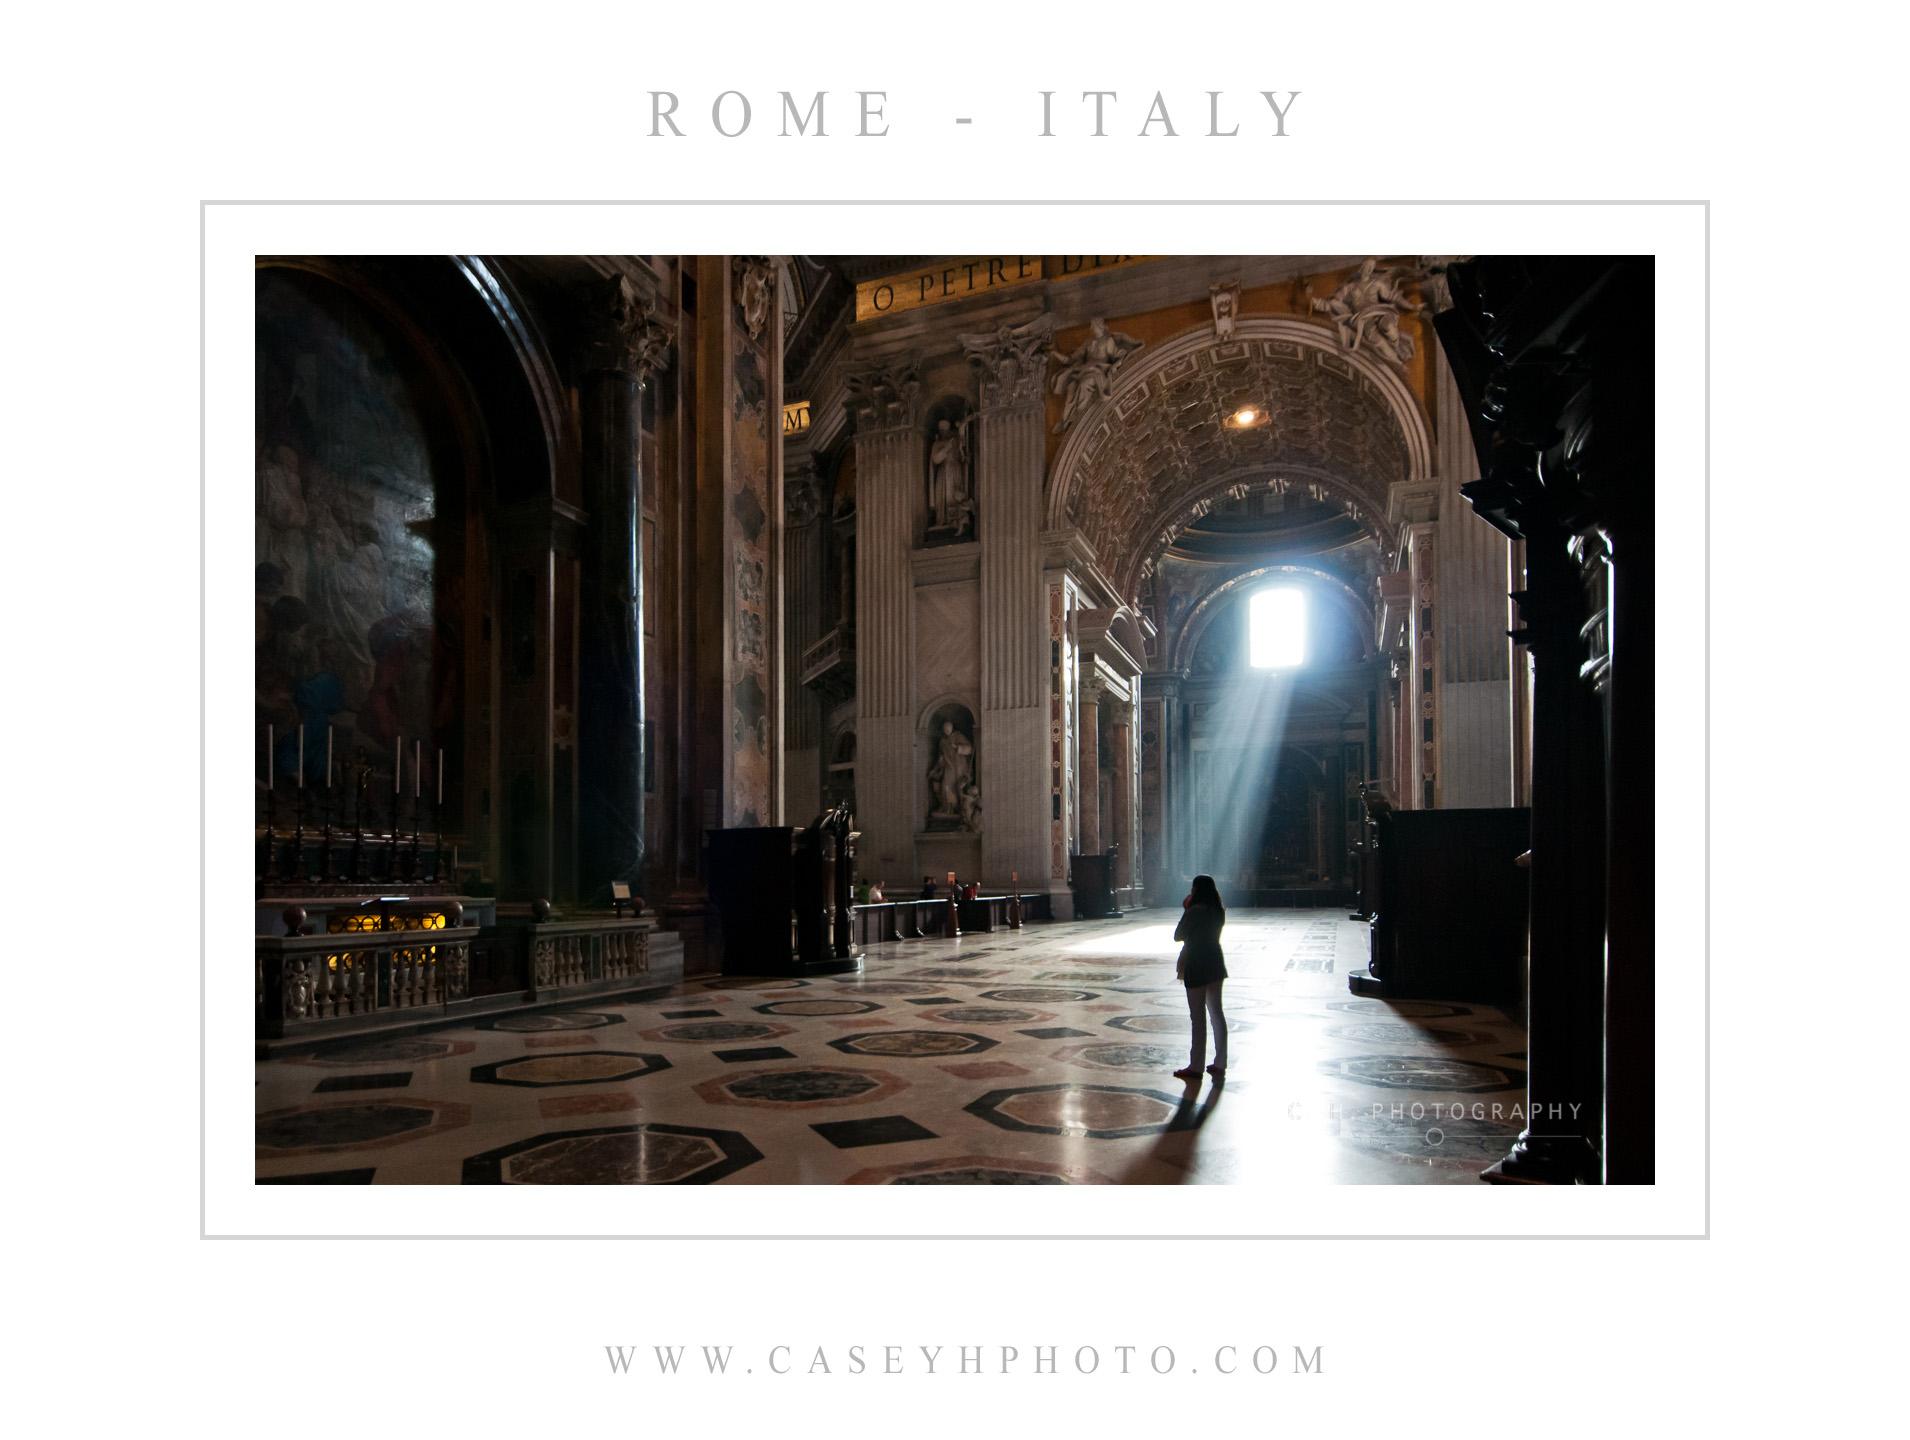 St Peters Basilica - Vatican City - Rome - Lazio